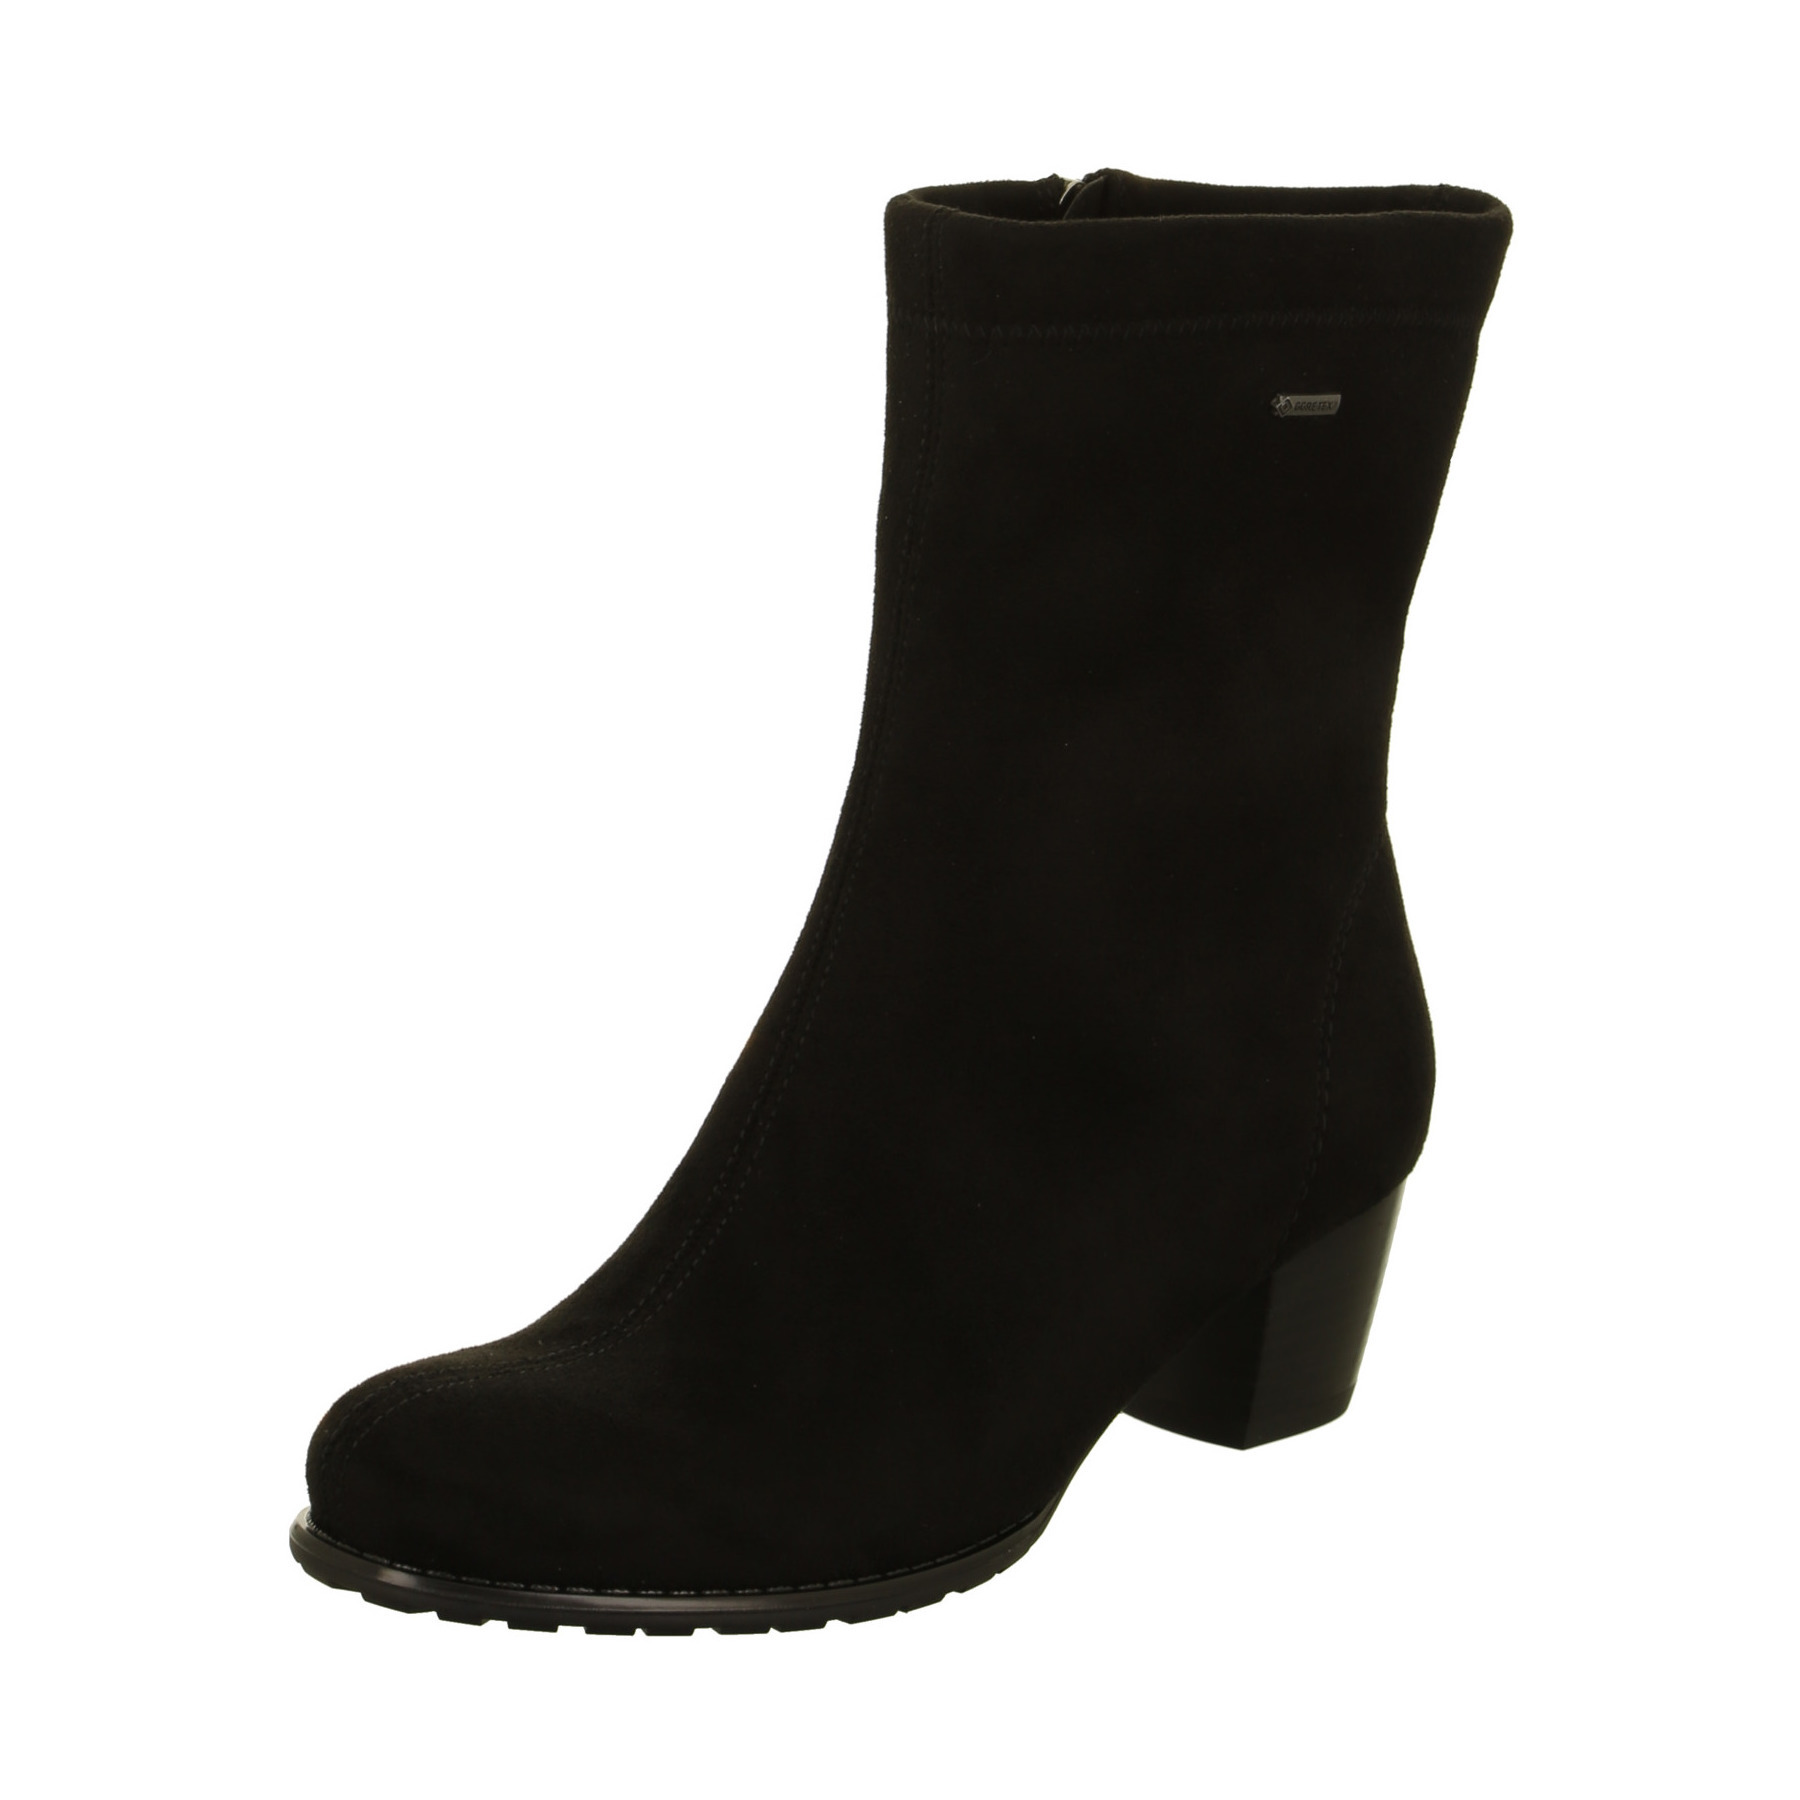 Soňa - Dámska obuv - Čižmy - Gore-texová dámska čižma značky Ara 892dfdfc70